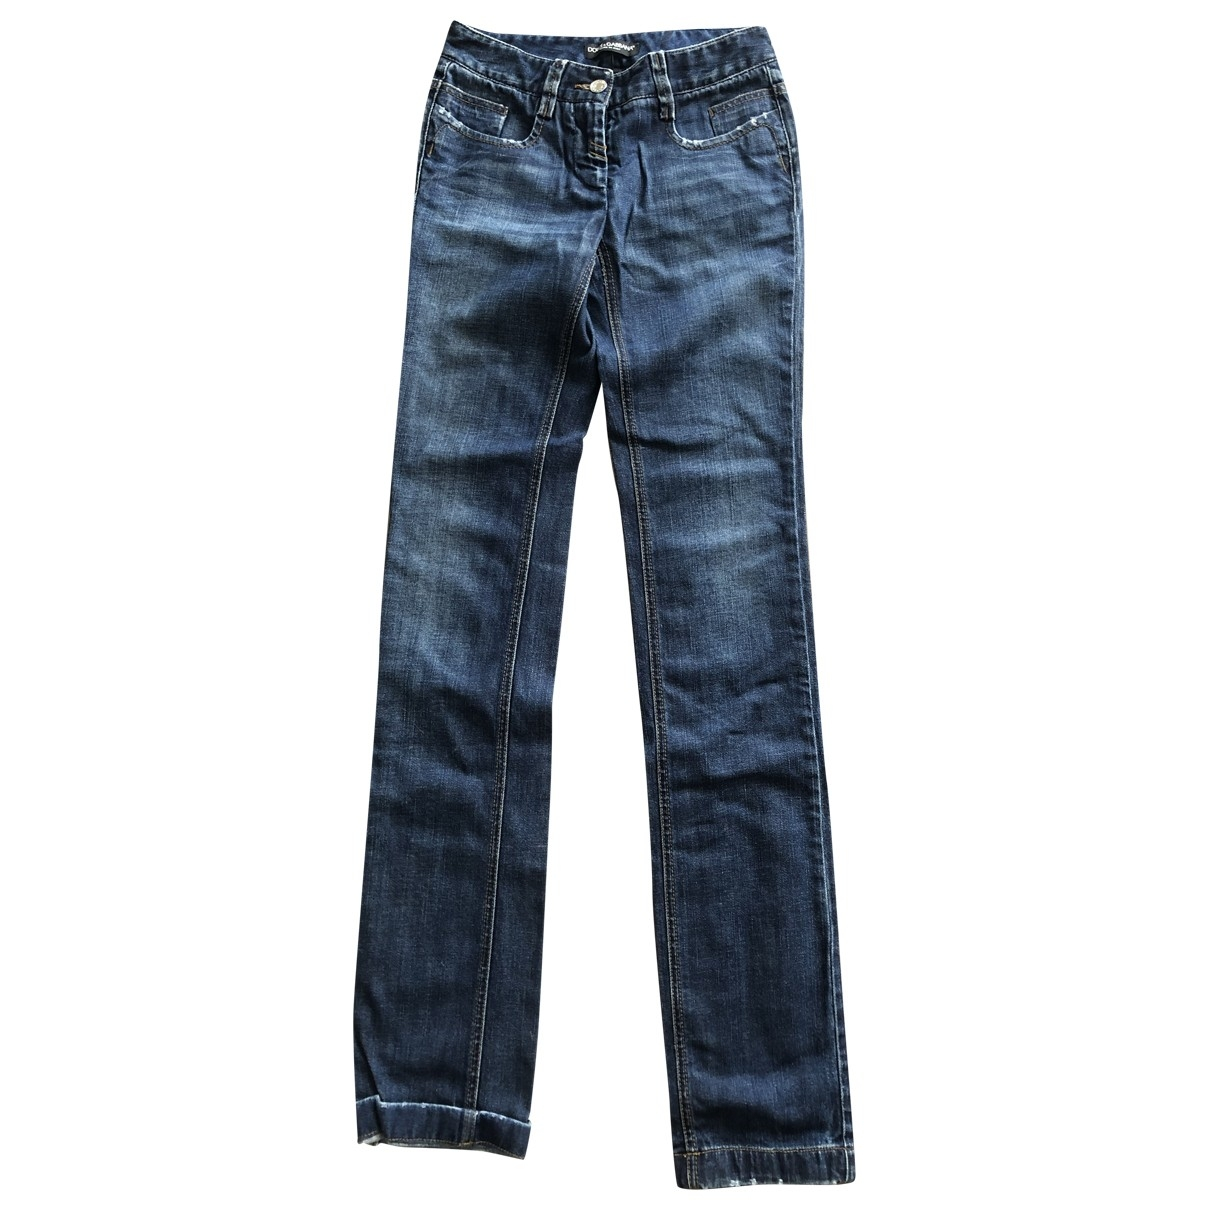 Dolce & Gabbana \N Blue Cotton Jeans for Women 36 FR